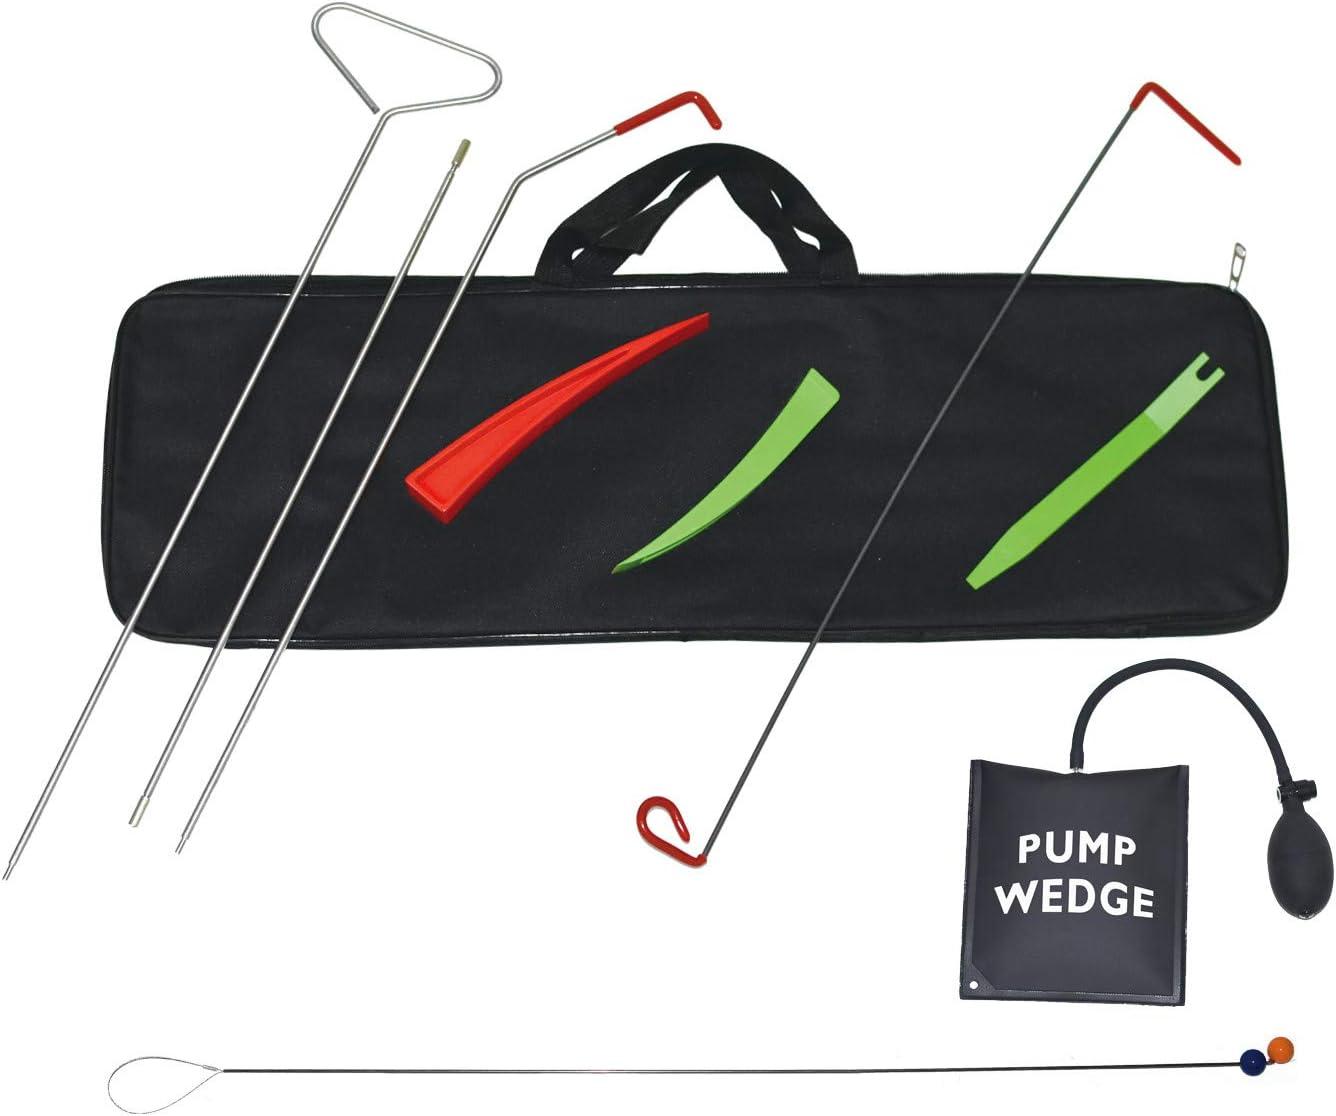 Professional Tools Set for Cars and Trucks Tool Bag Non Marring Wedge Air Pump Wedge Lasso Grabber E-HEELP Emergency Car Repair Tool Kit with Long Reach Grabber